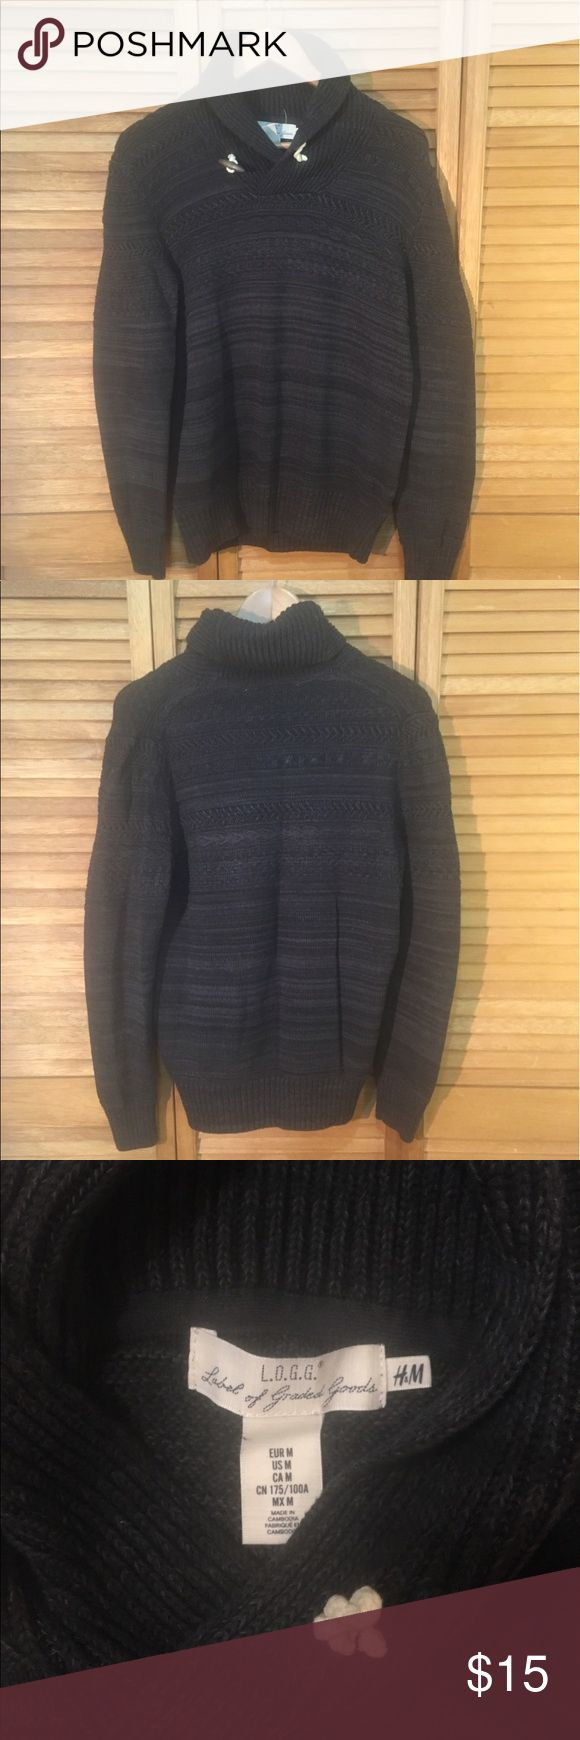 H&M Men's Sweater H&M Men's Sweater, great condition! Size M H&M Sweaters Cowl & Turtlenecks